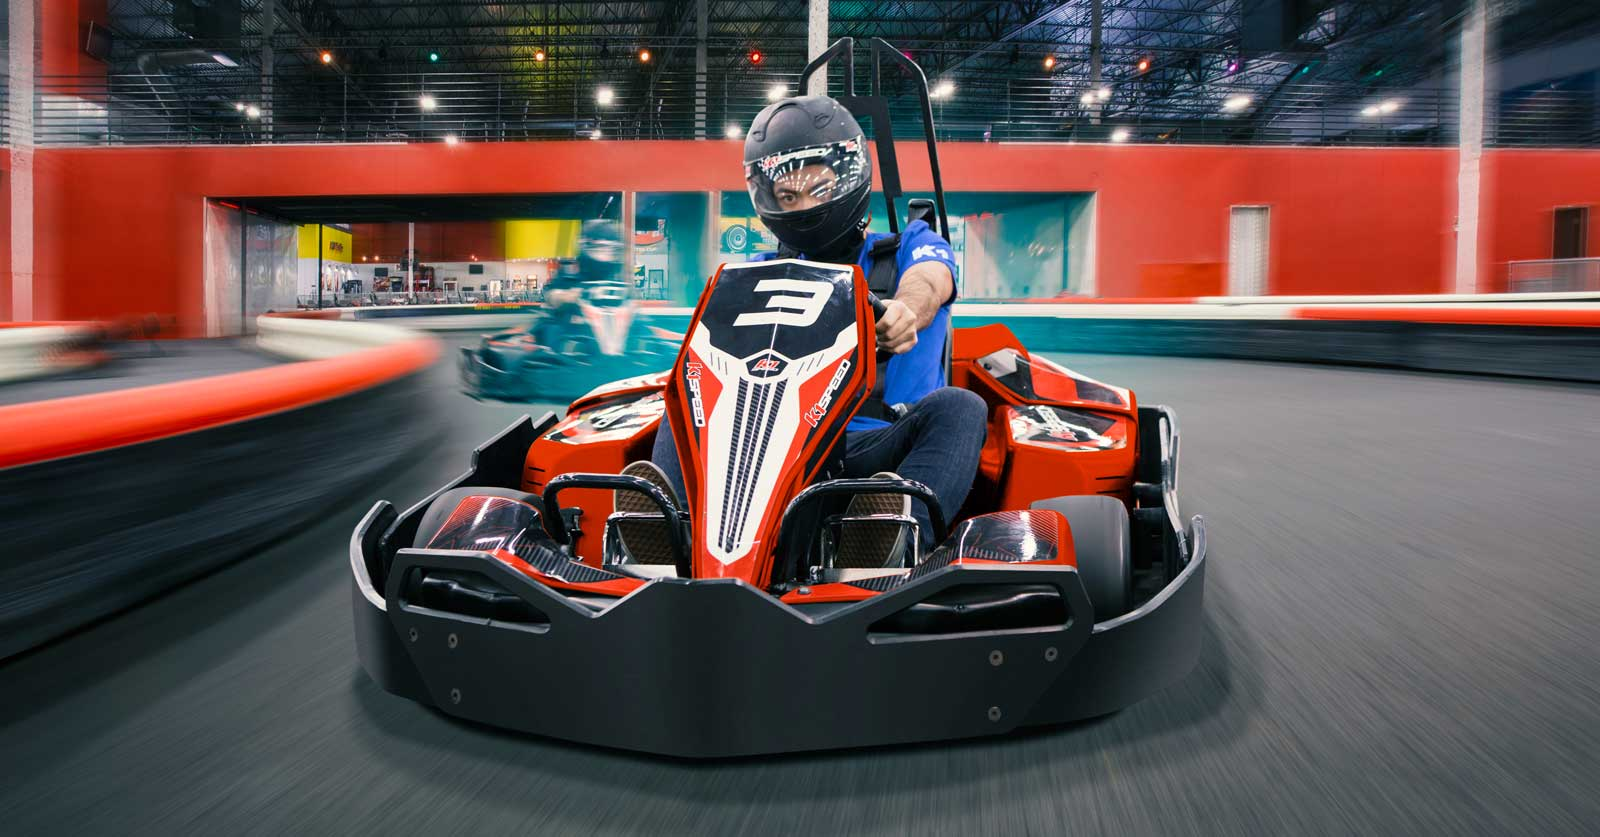 K1 Speed Race Weekend Is Here